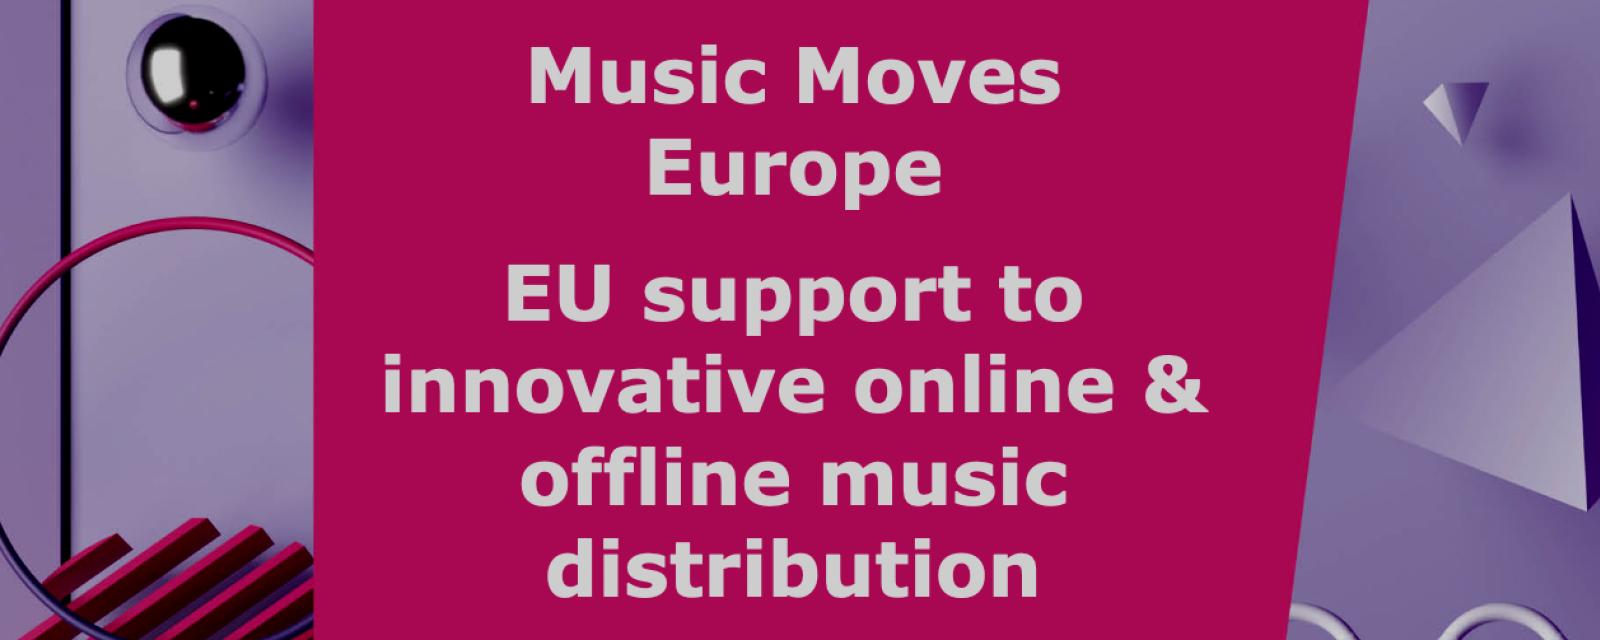 musicmoveseurope-etude-distribution